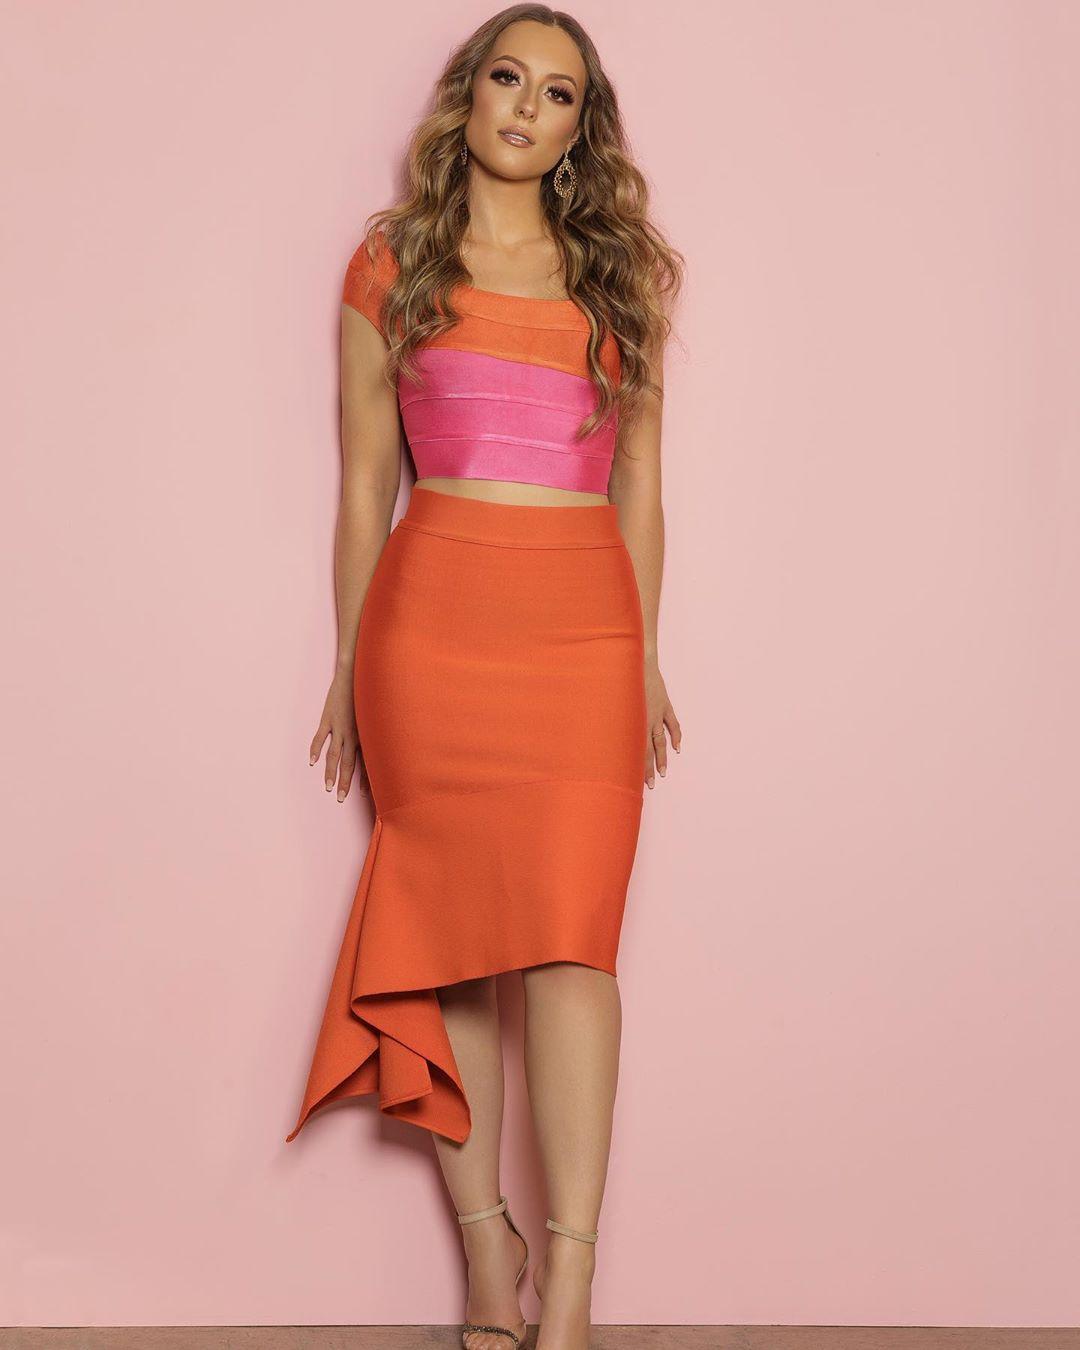 cristine boff sartor, segunda finalista de miss latinoamerica 2019. - Página 6 66803811